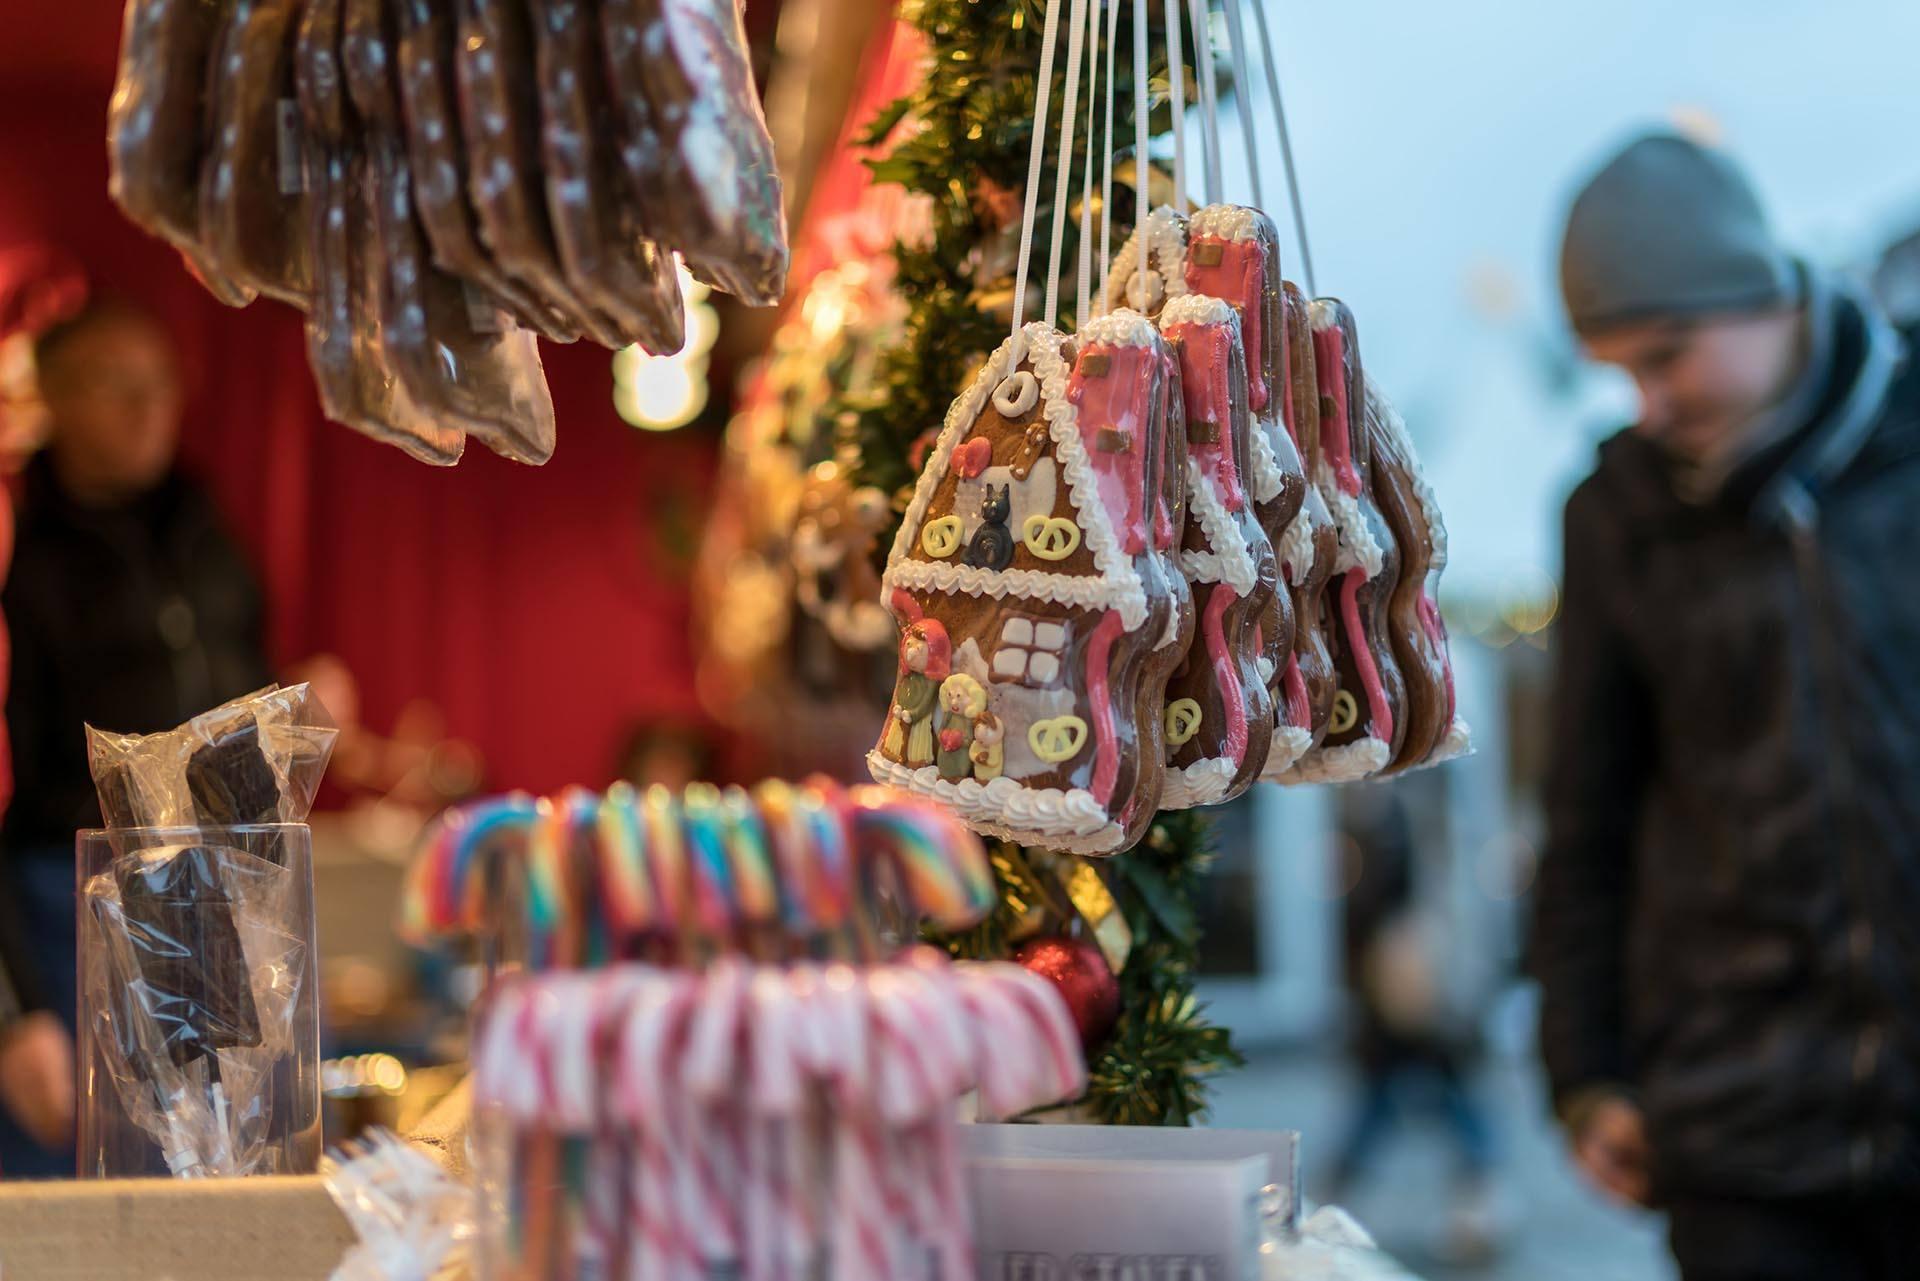 I più belli tra i mercatini di Natale in Alto Adige